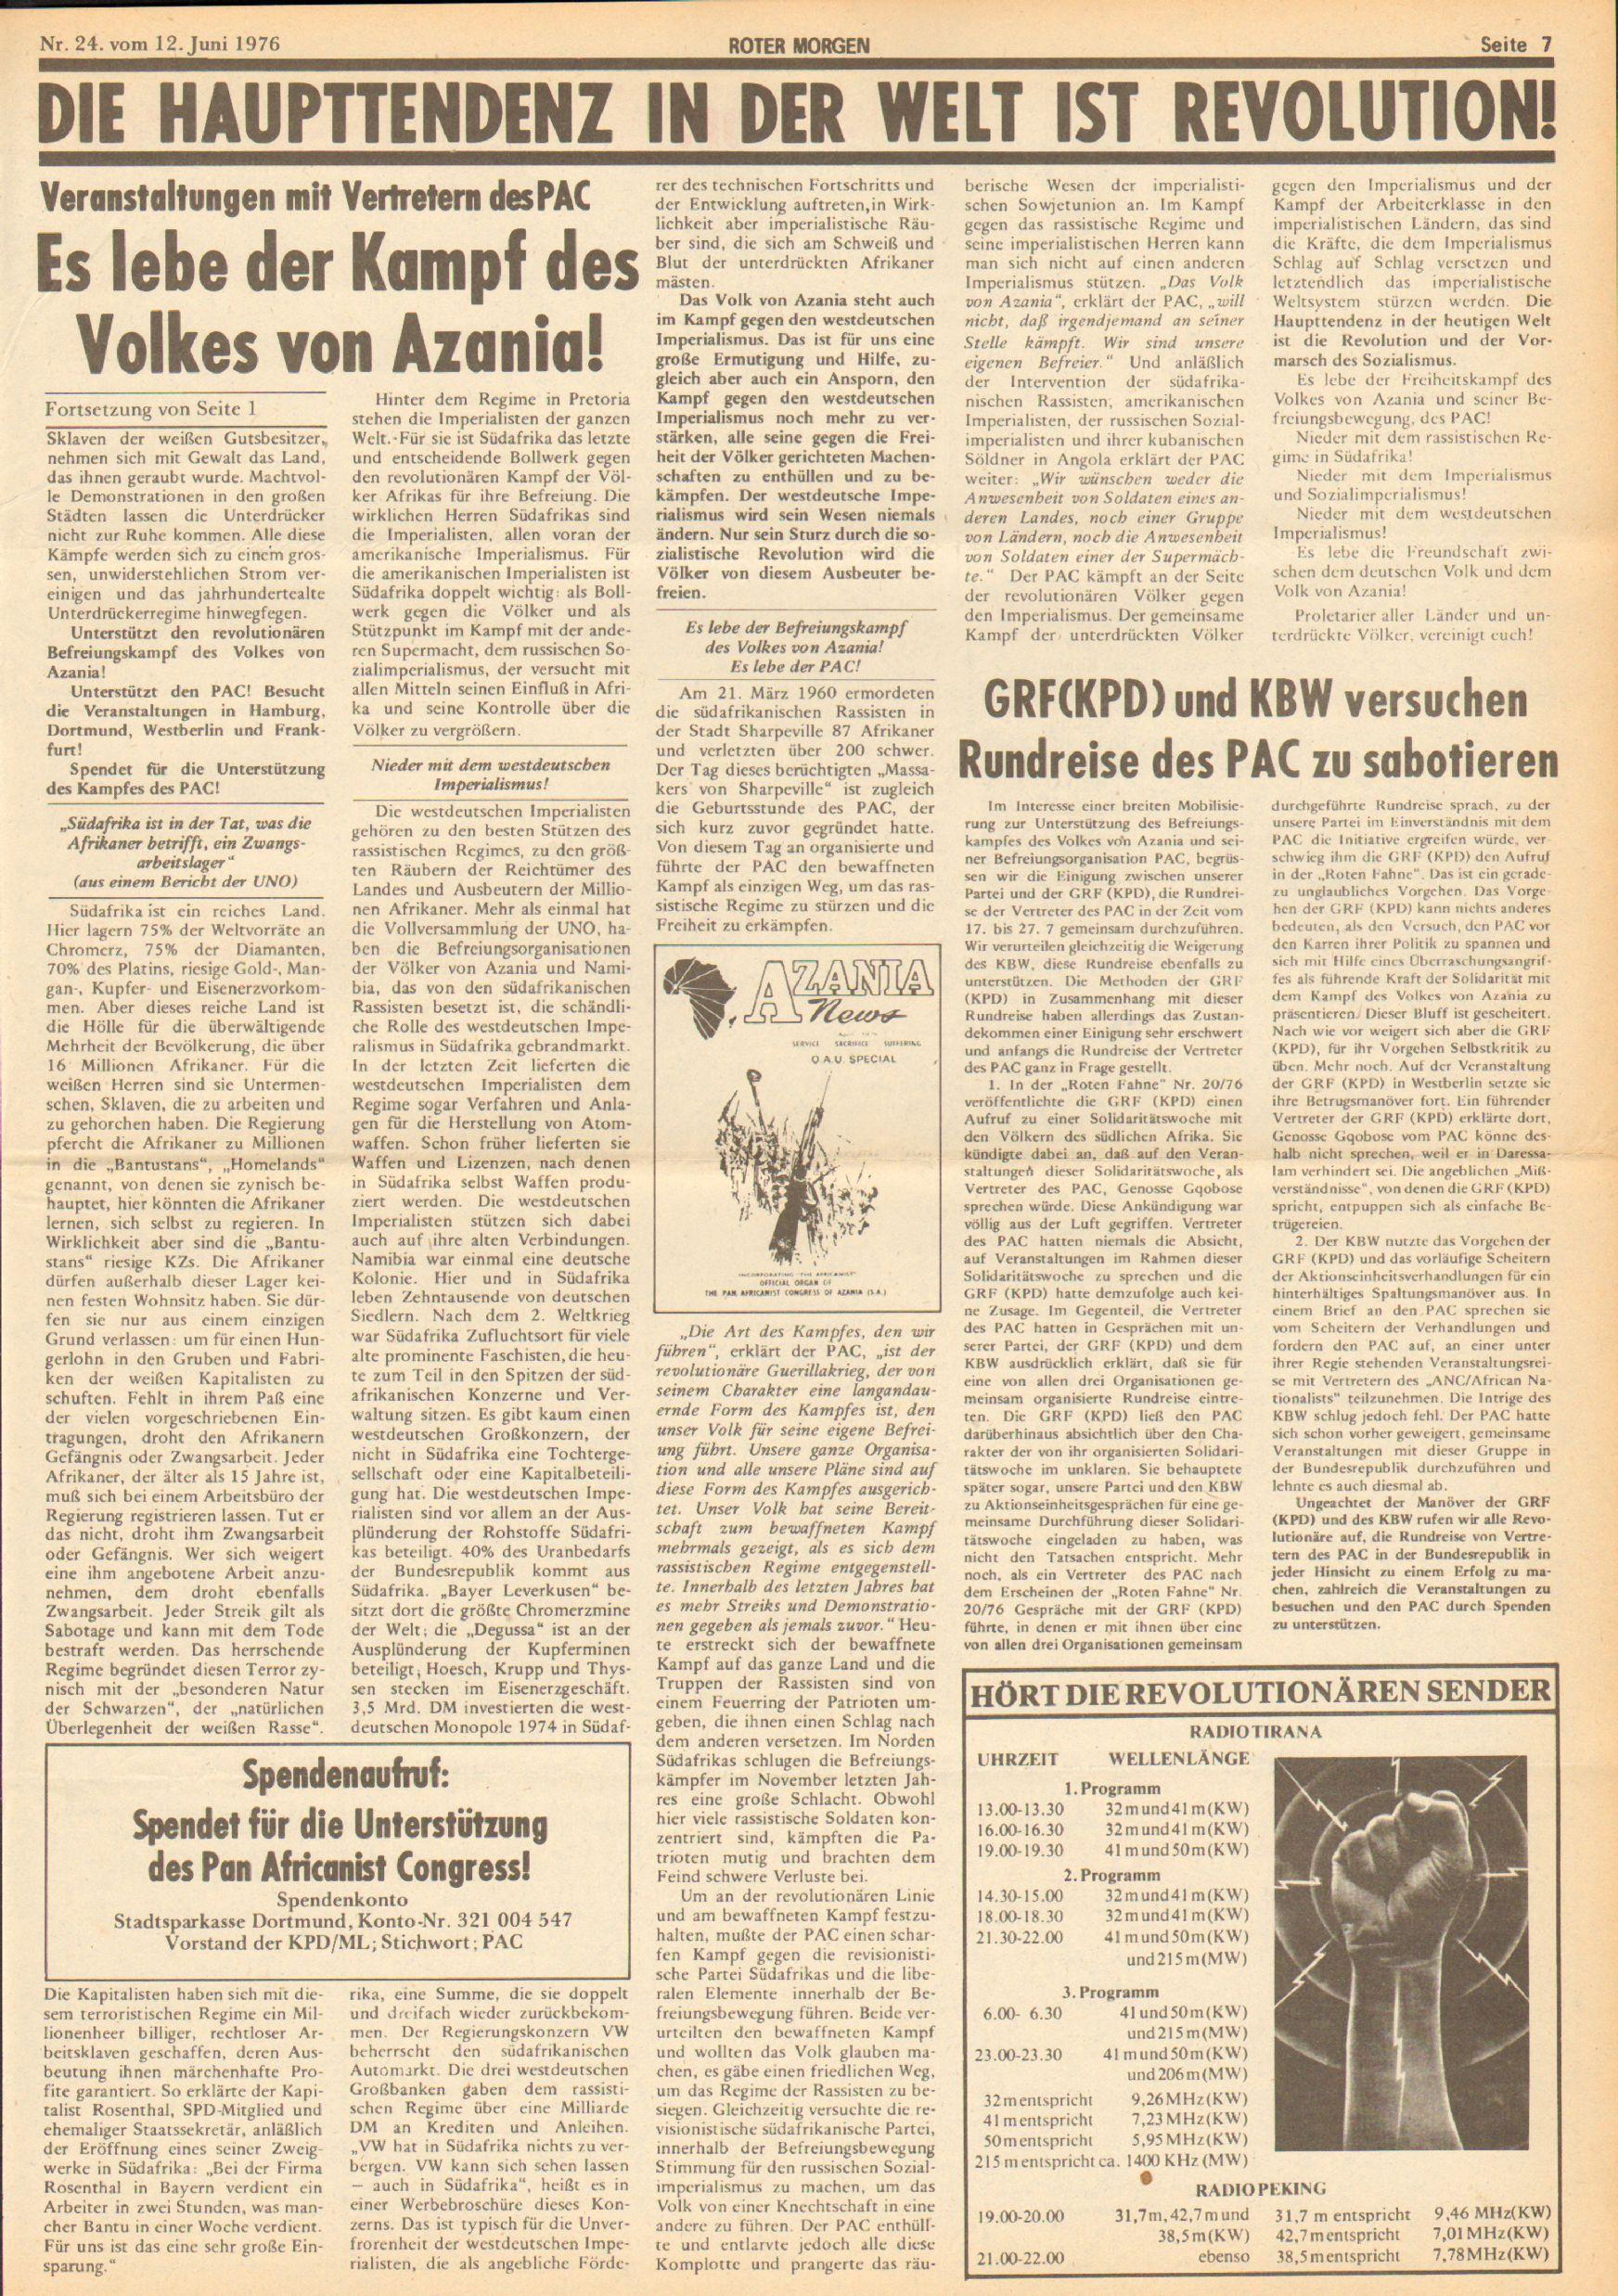 Roter Morgen, 10. Jg., 12. Juni 1976, Nr. 24, Seite 7